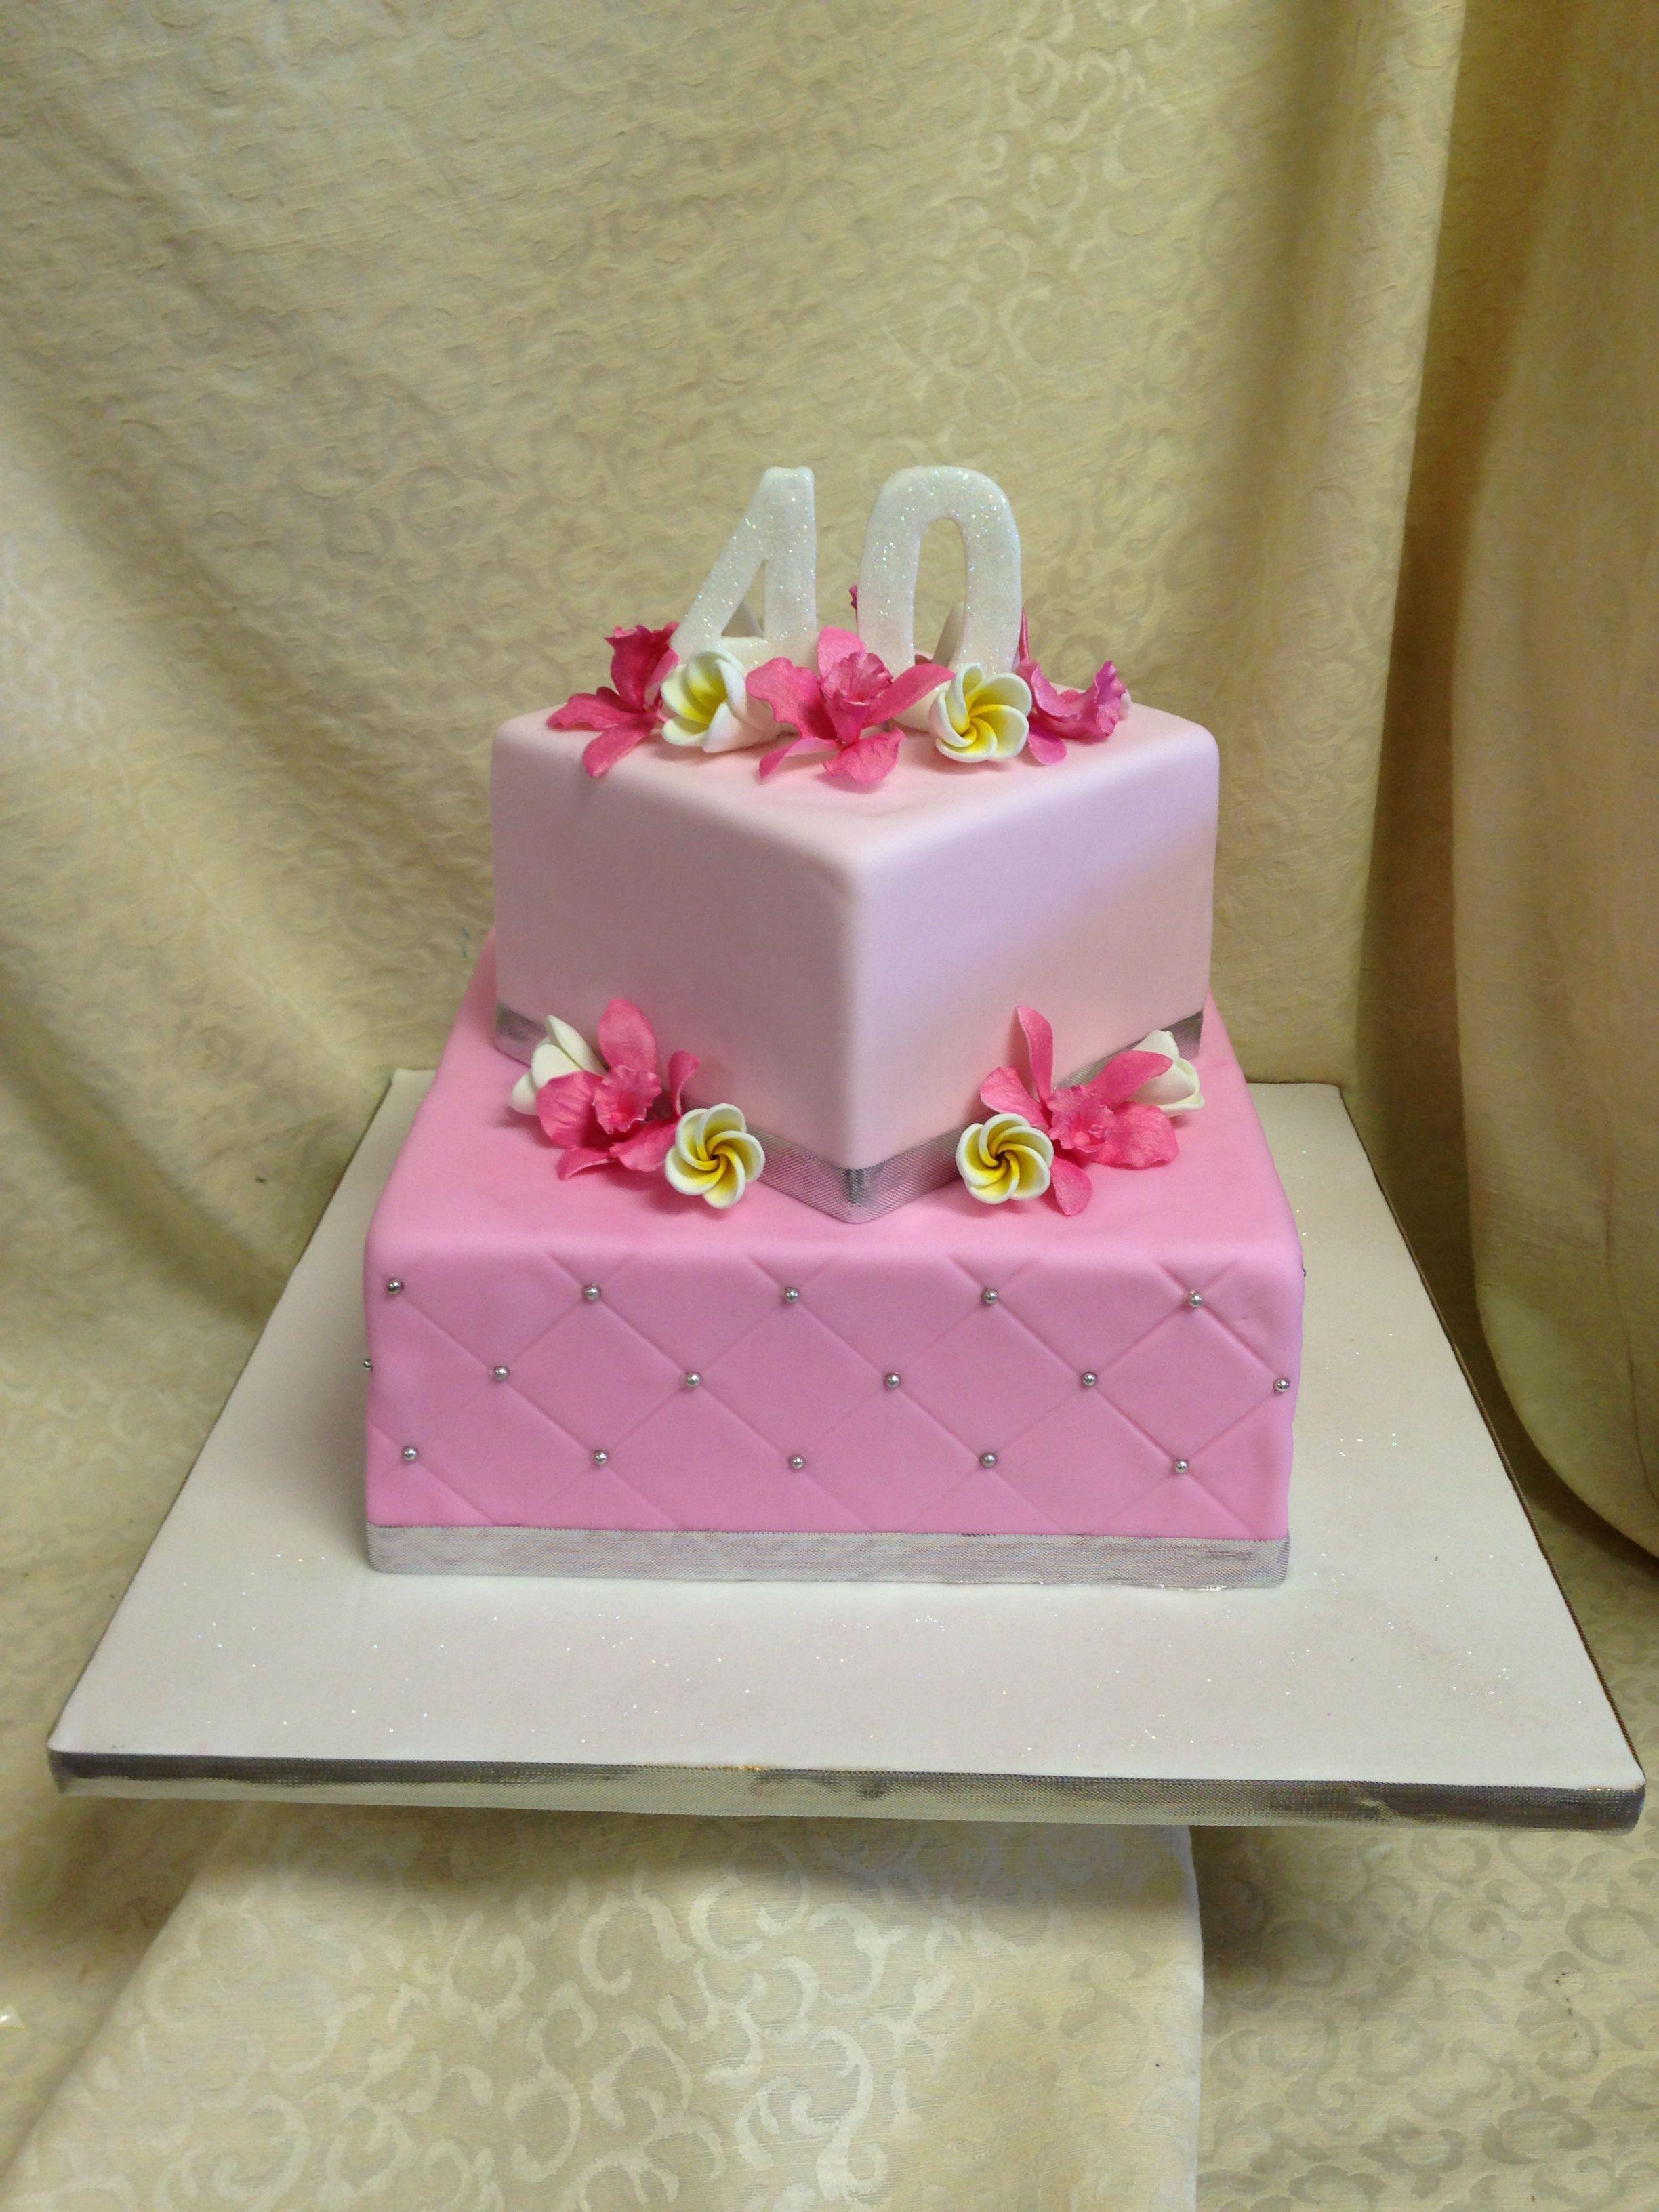 Marvelous Womens 40Year Old Birthday Pink Fondant Cake Sugar Flowers Funny Birthday Cards Online Bapapcheapnameinfo